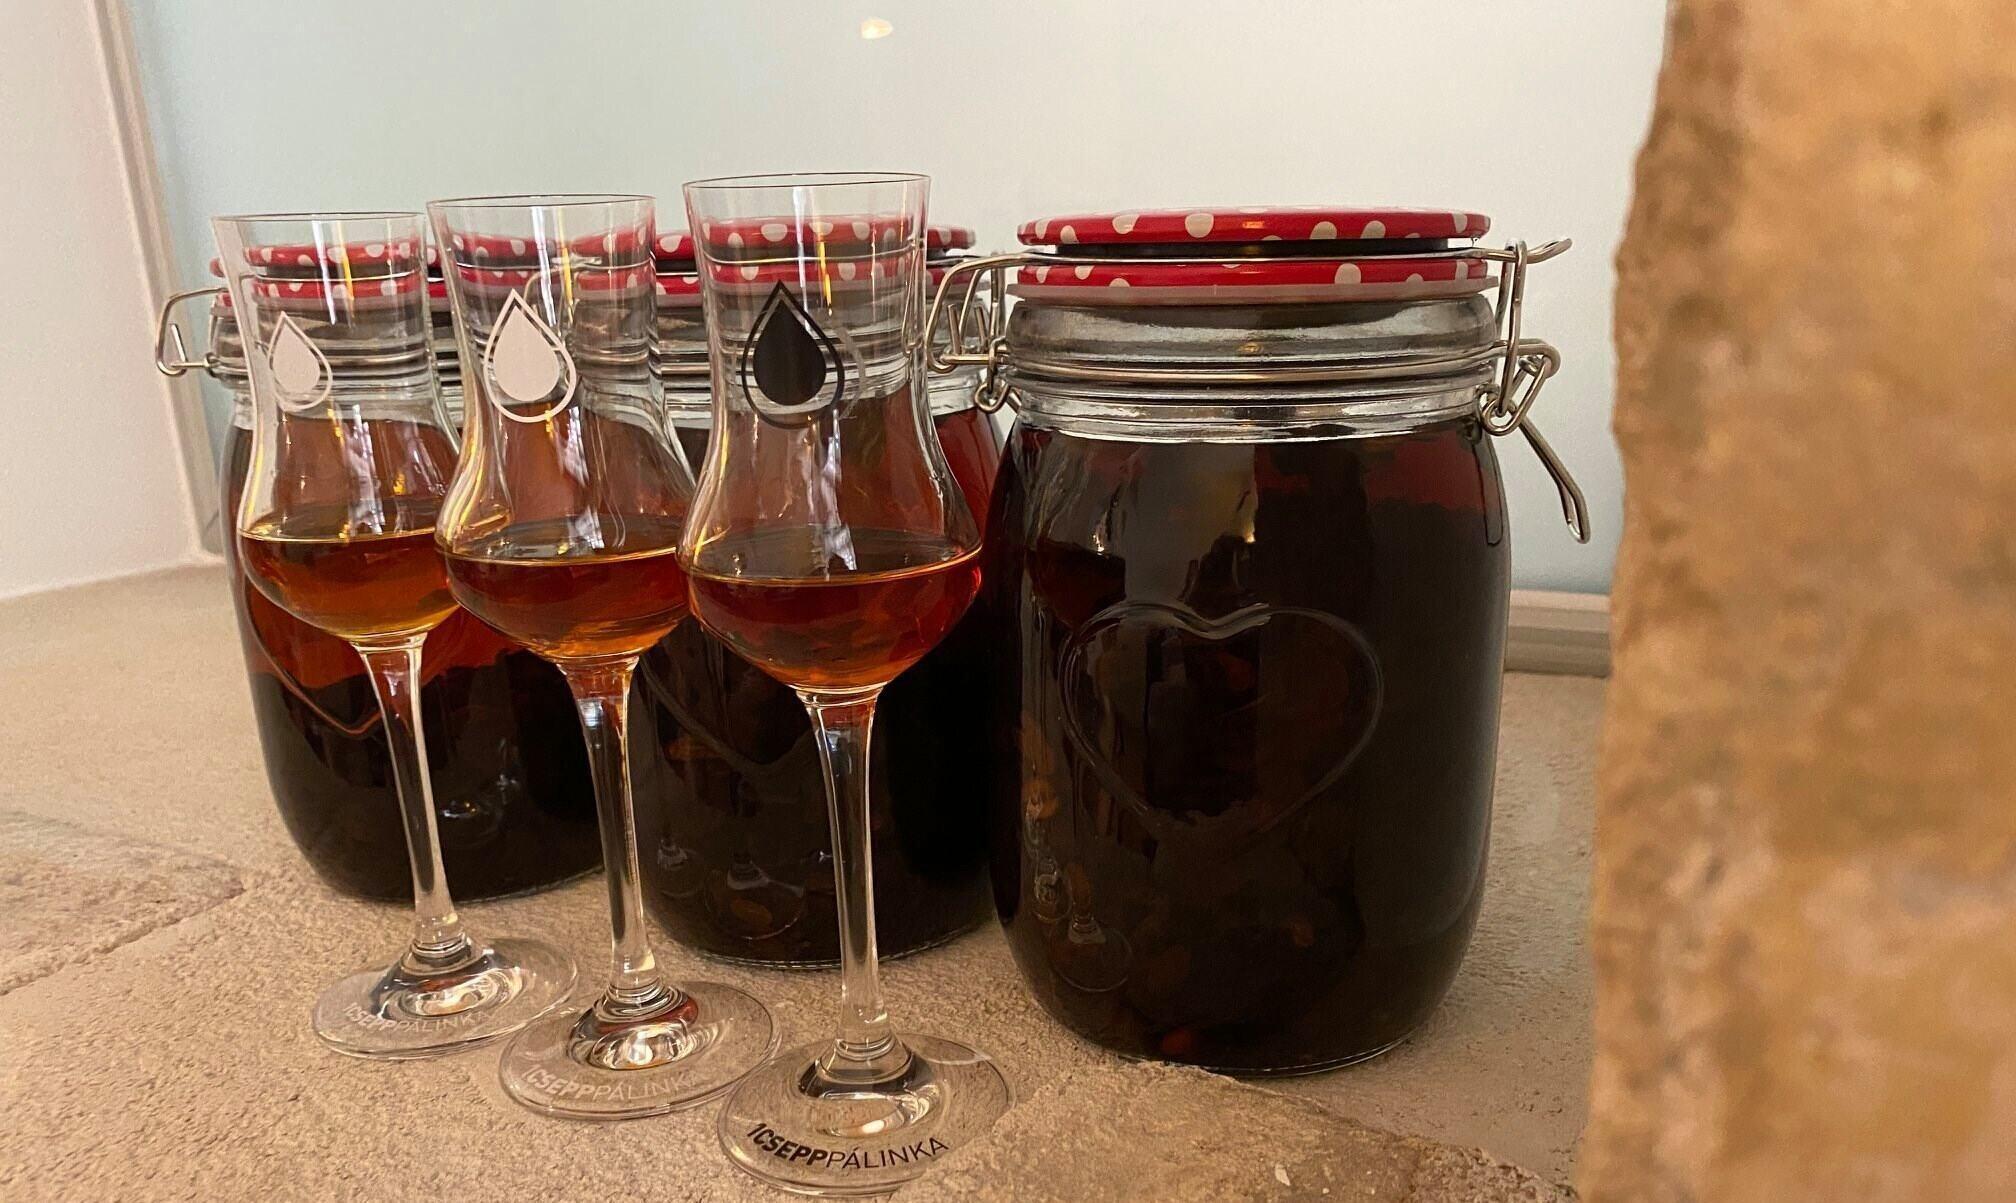 Pálinka Üveg Glass 1Csepp Distillery